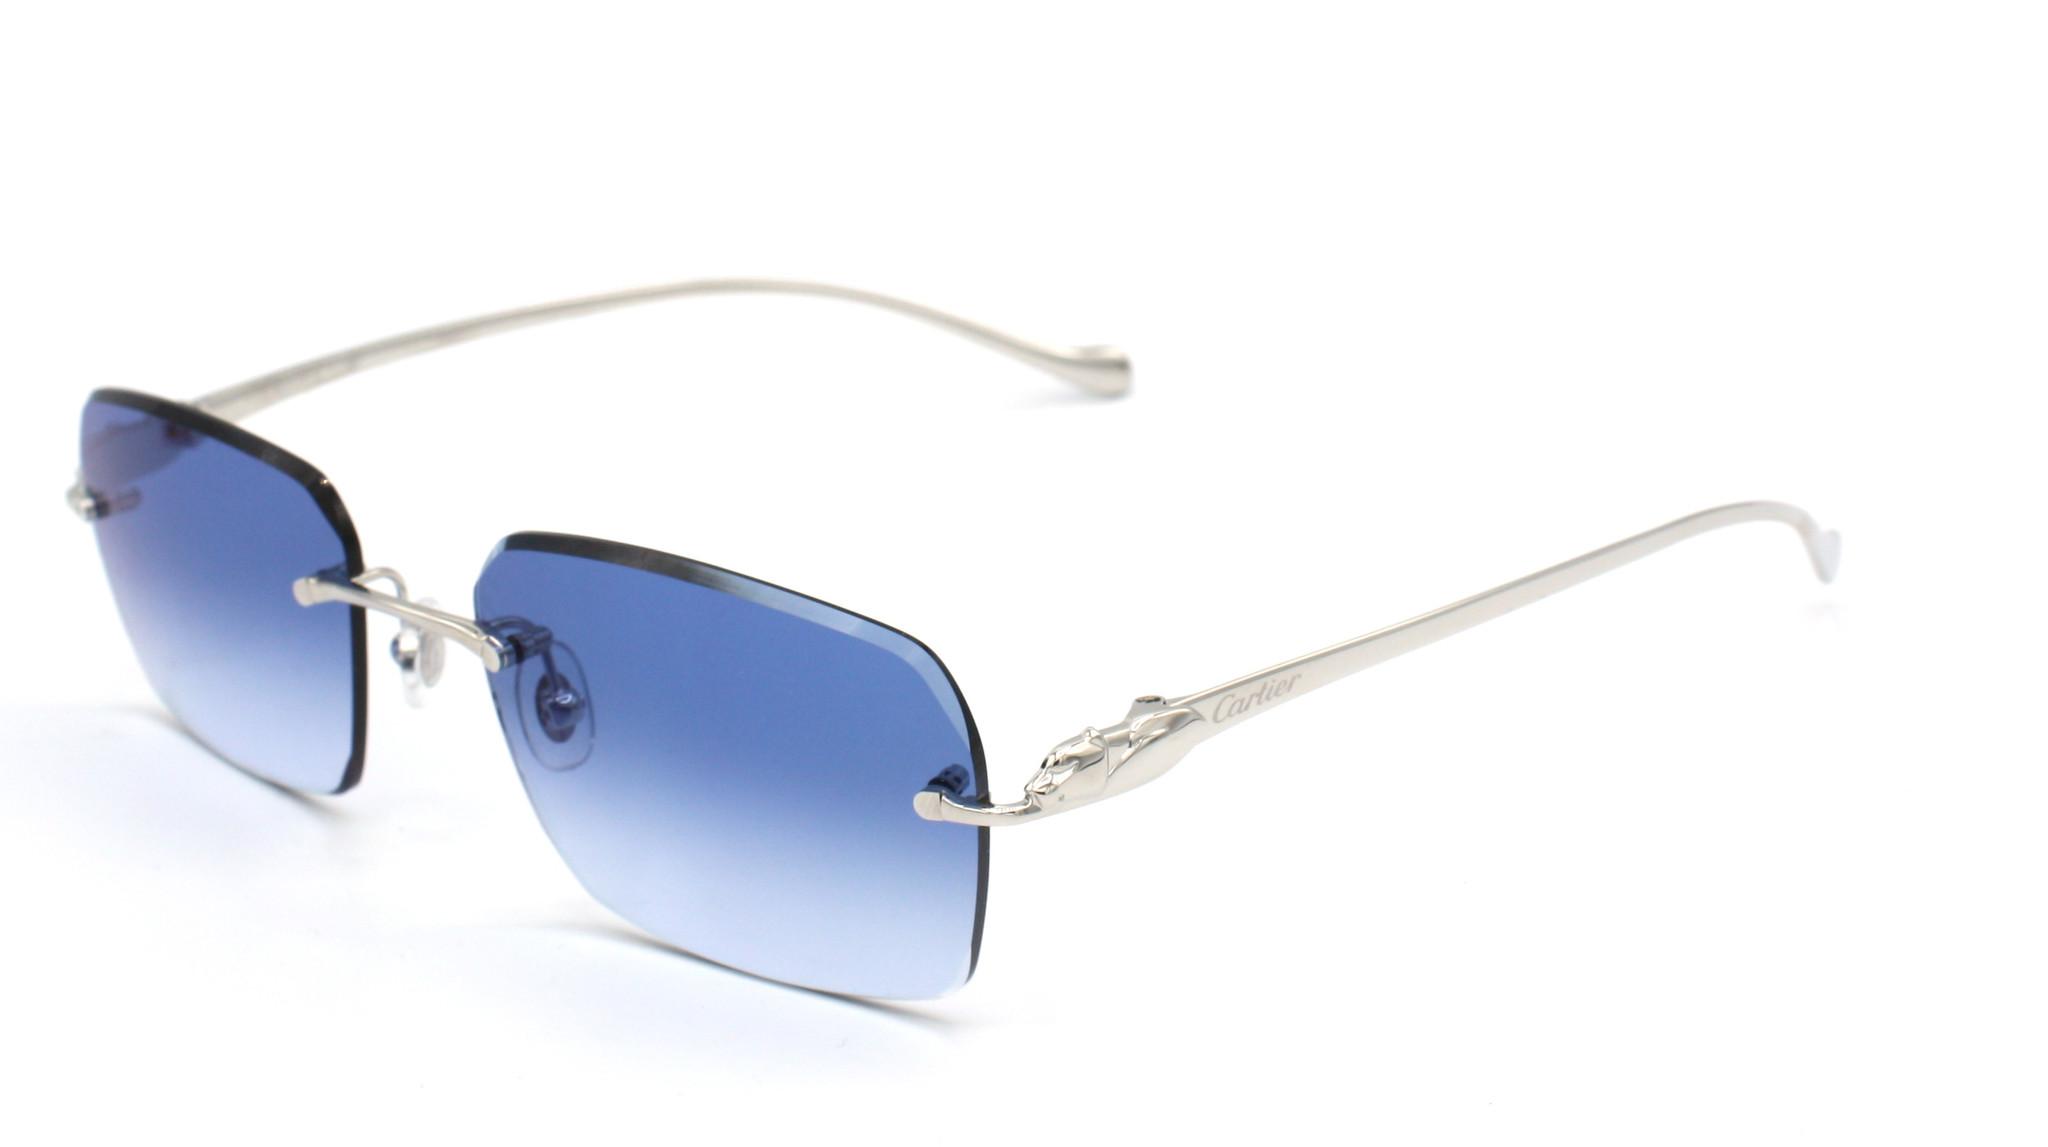 Cartier - CT0061O - 003 - Marlin Greyish Blue Diamond Cut-2